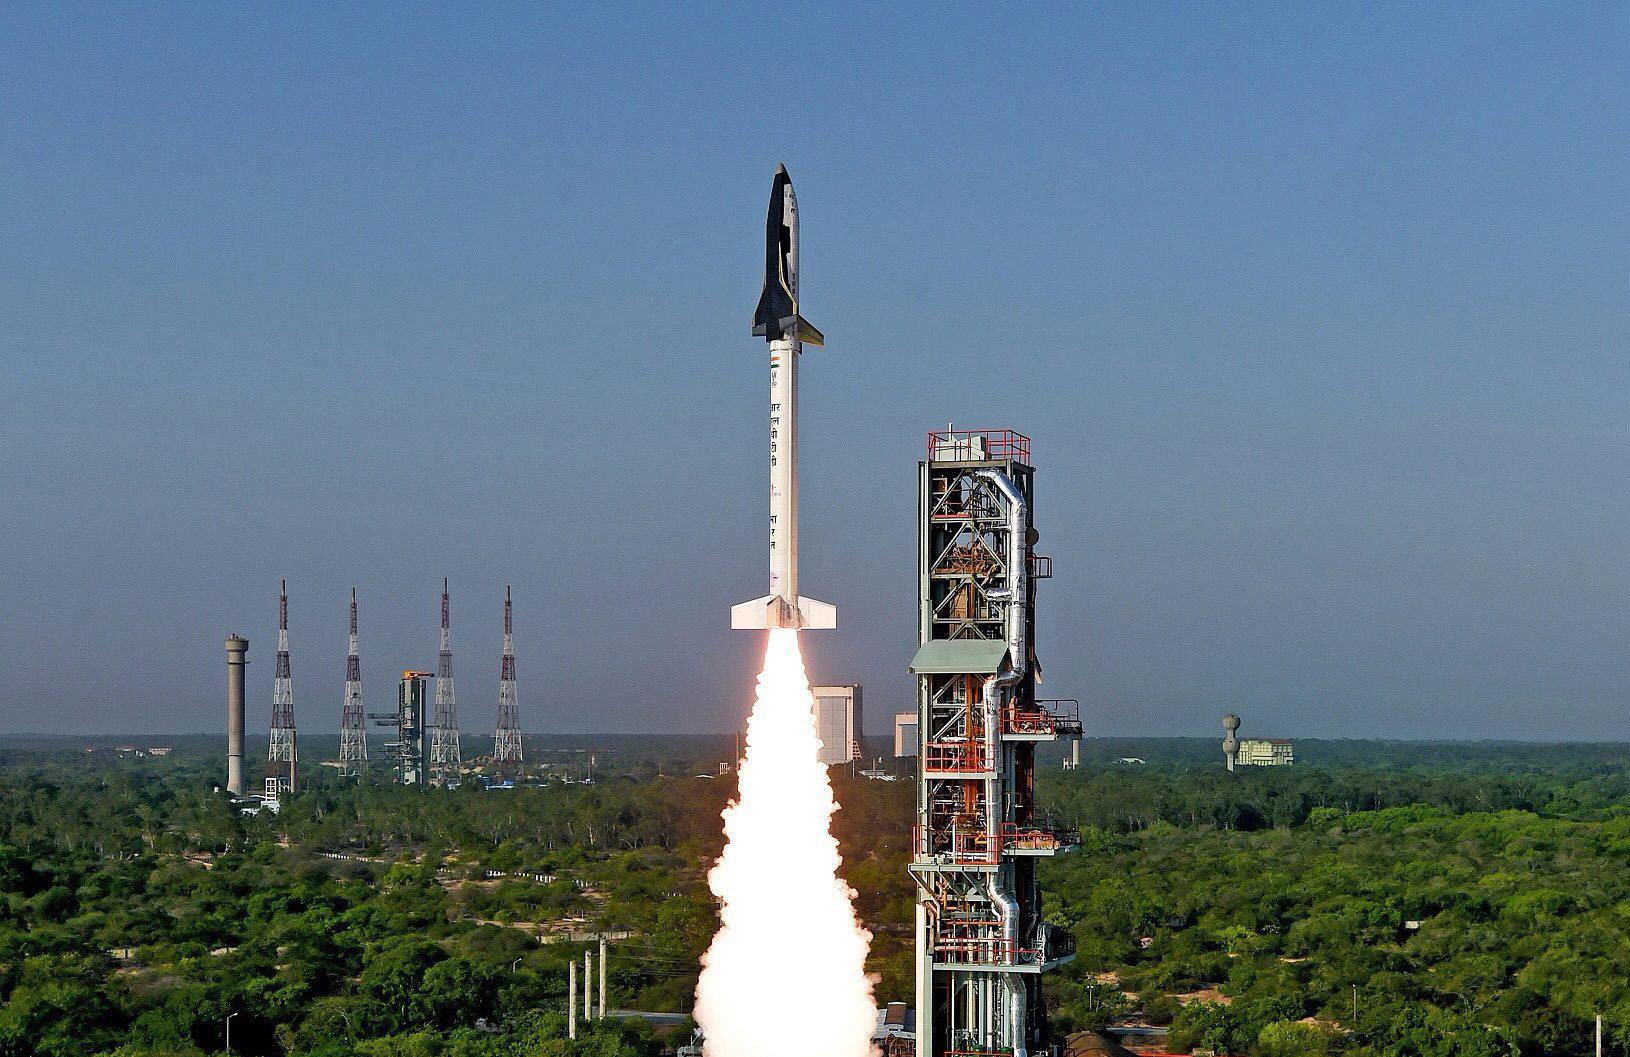 India's Reusable Launch Vehicle (RLV)-TD taking off from Sriharikota, Andhra Pradesh, May 23, 2016.